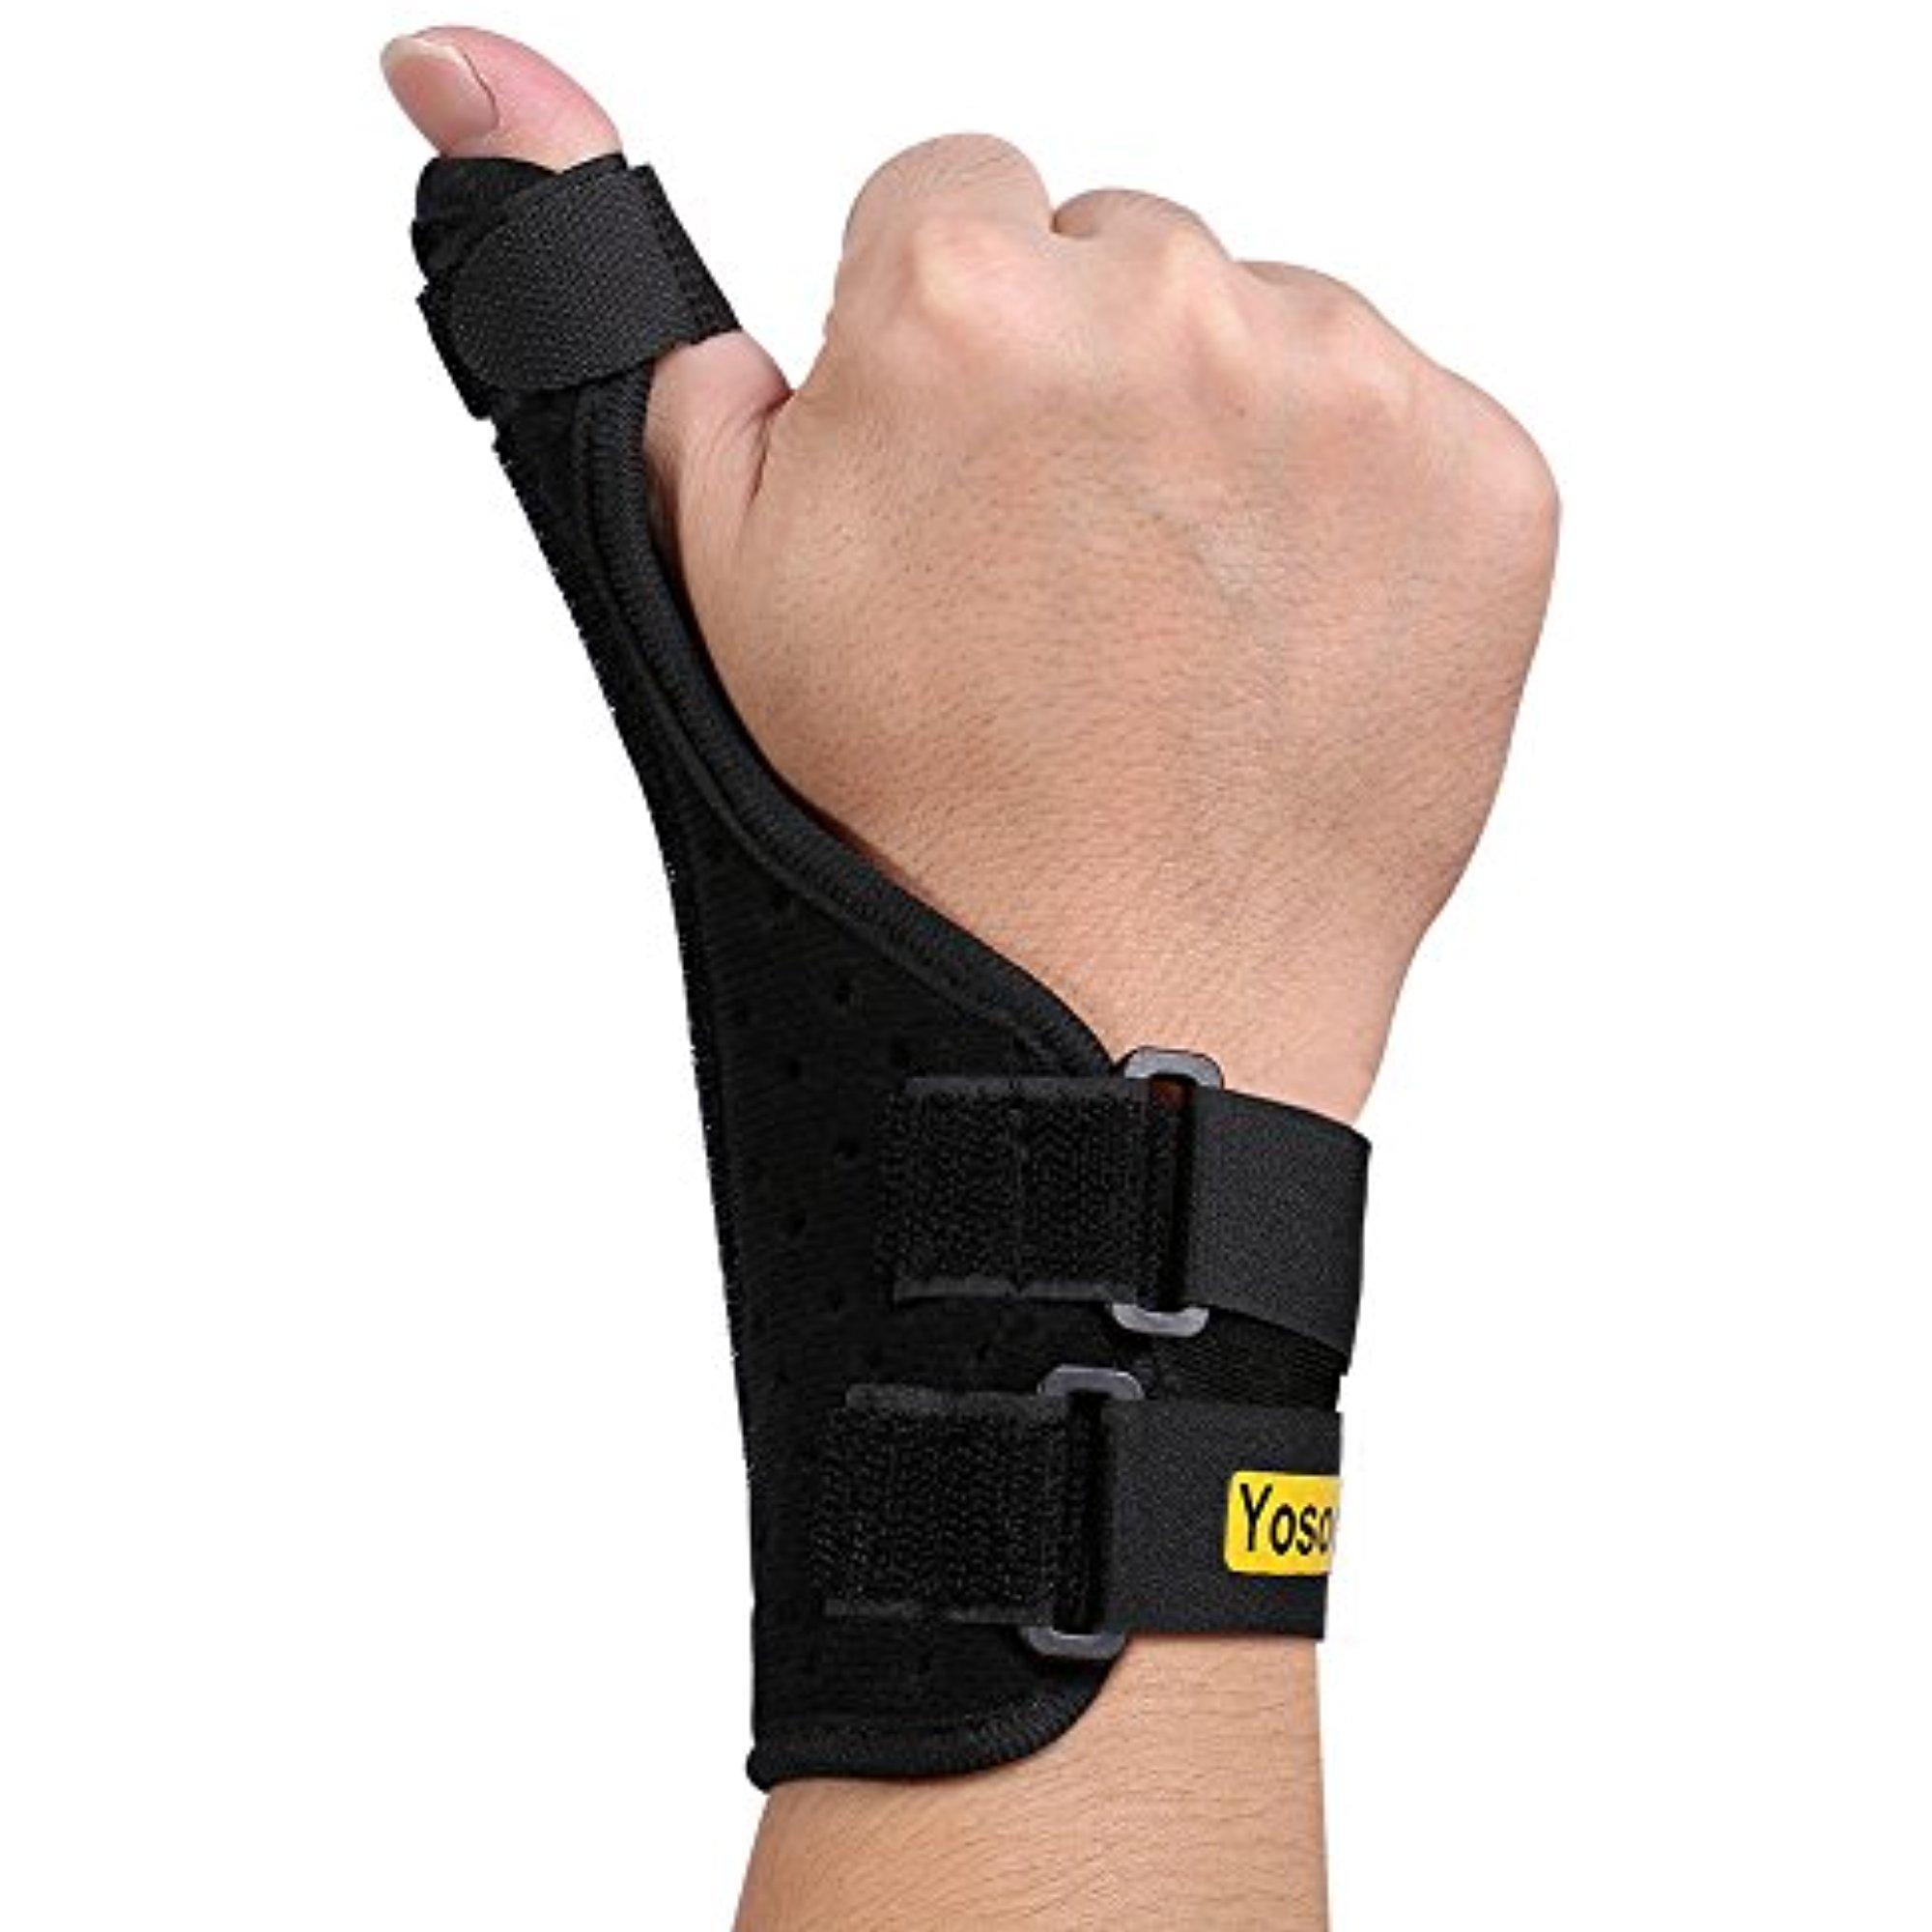 Yosoo Thumb Splint Adjustable Neoprene Hand Thumb Brace Stabilizer Guard Spica Support Your Finger for Arthritis Tendonitis Sprained Thumb Symptoms Broken Hyperextended Thumb, One Size, Unisex, Black